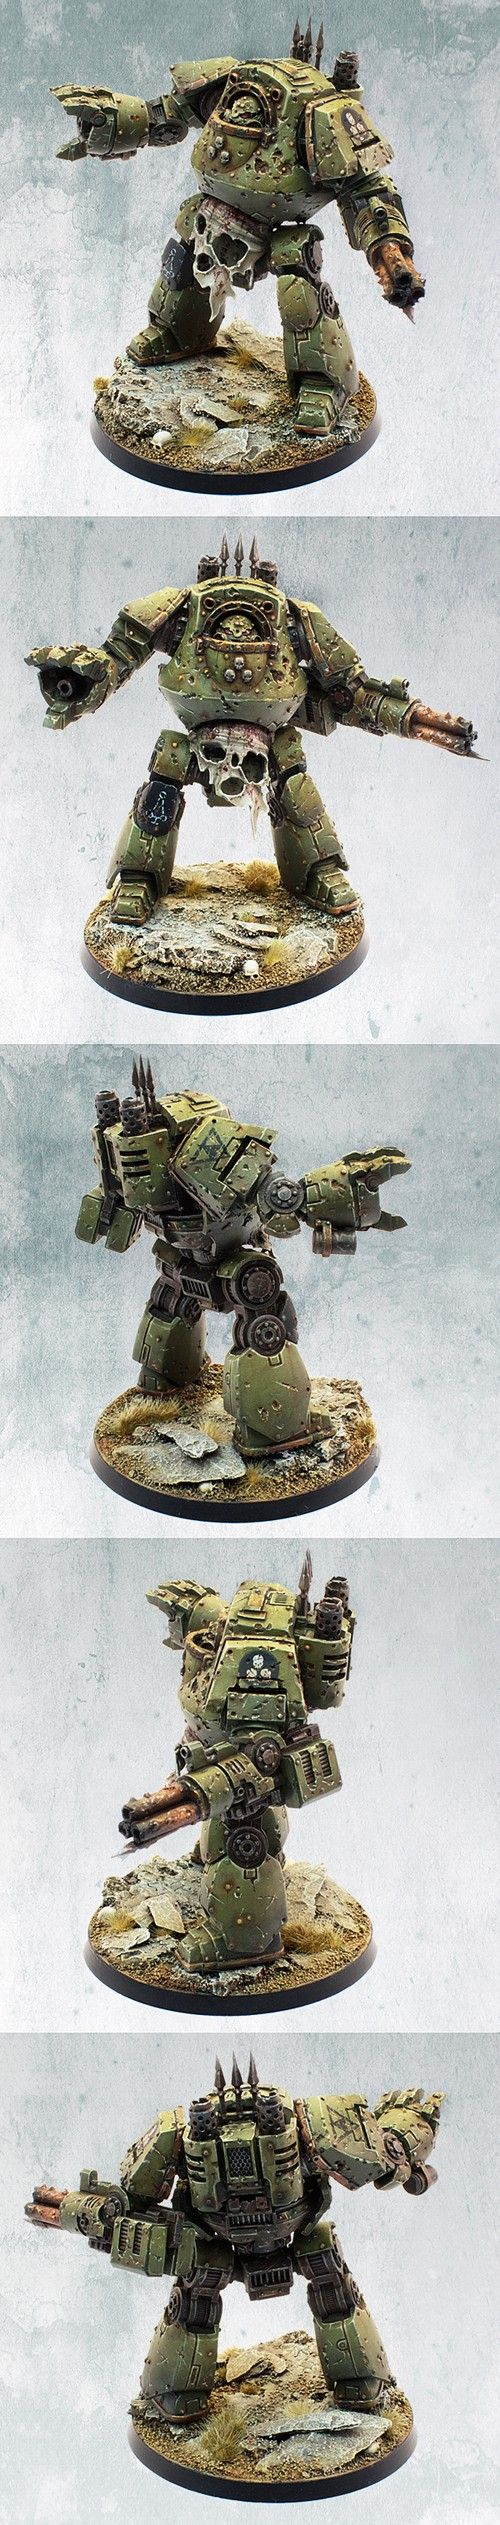 Nurgle Death Guard Chaos Space Marine Contemptor Dreadnought.